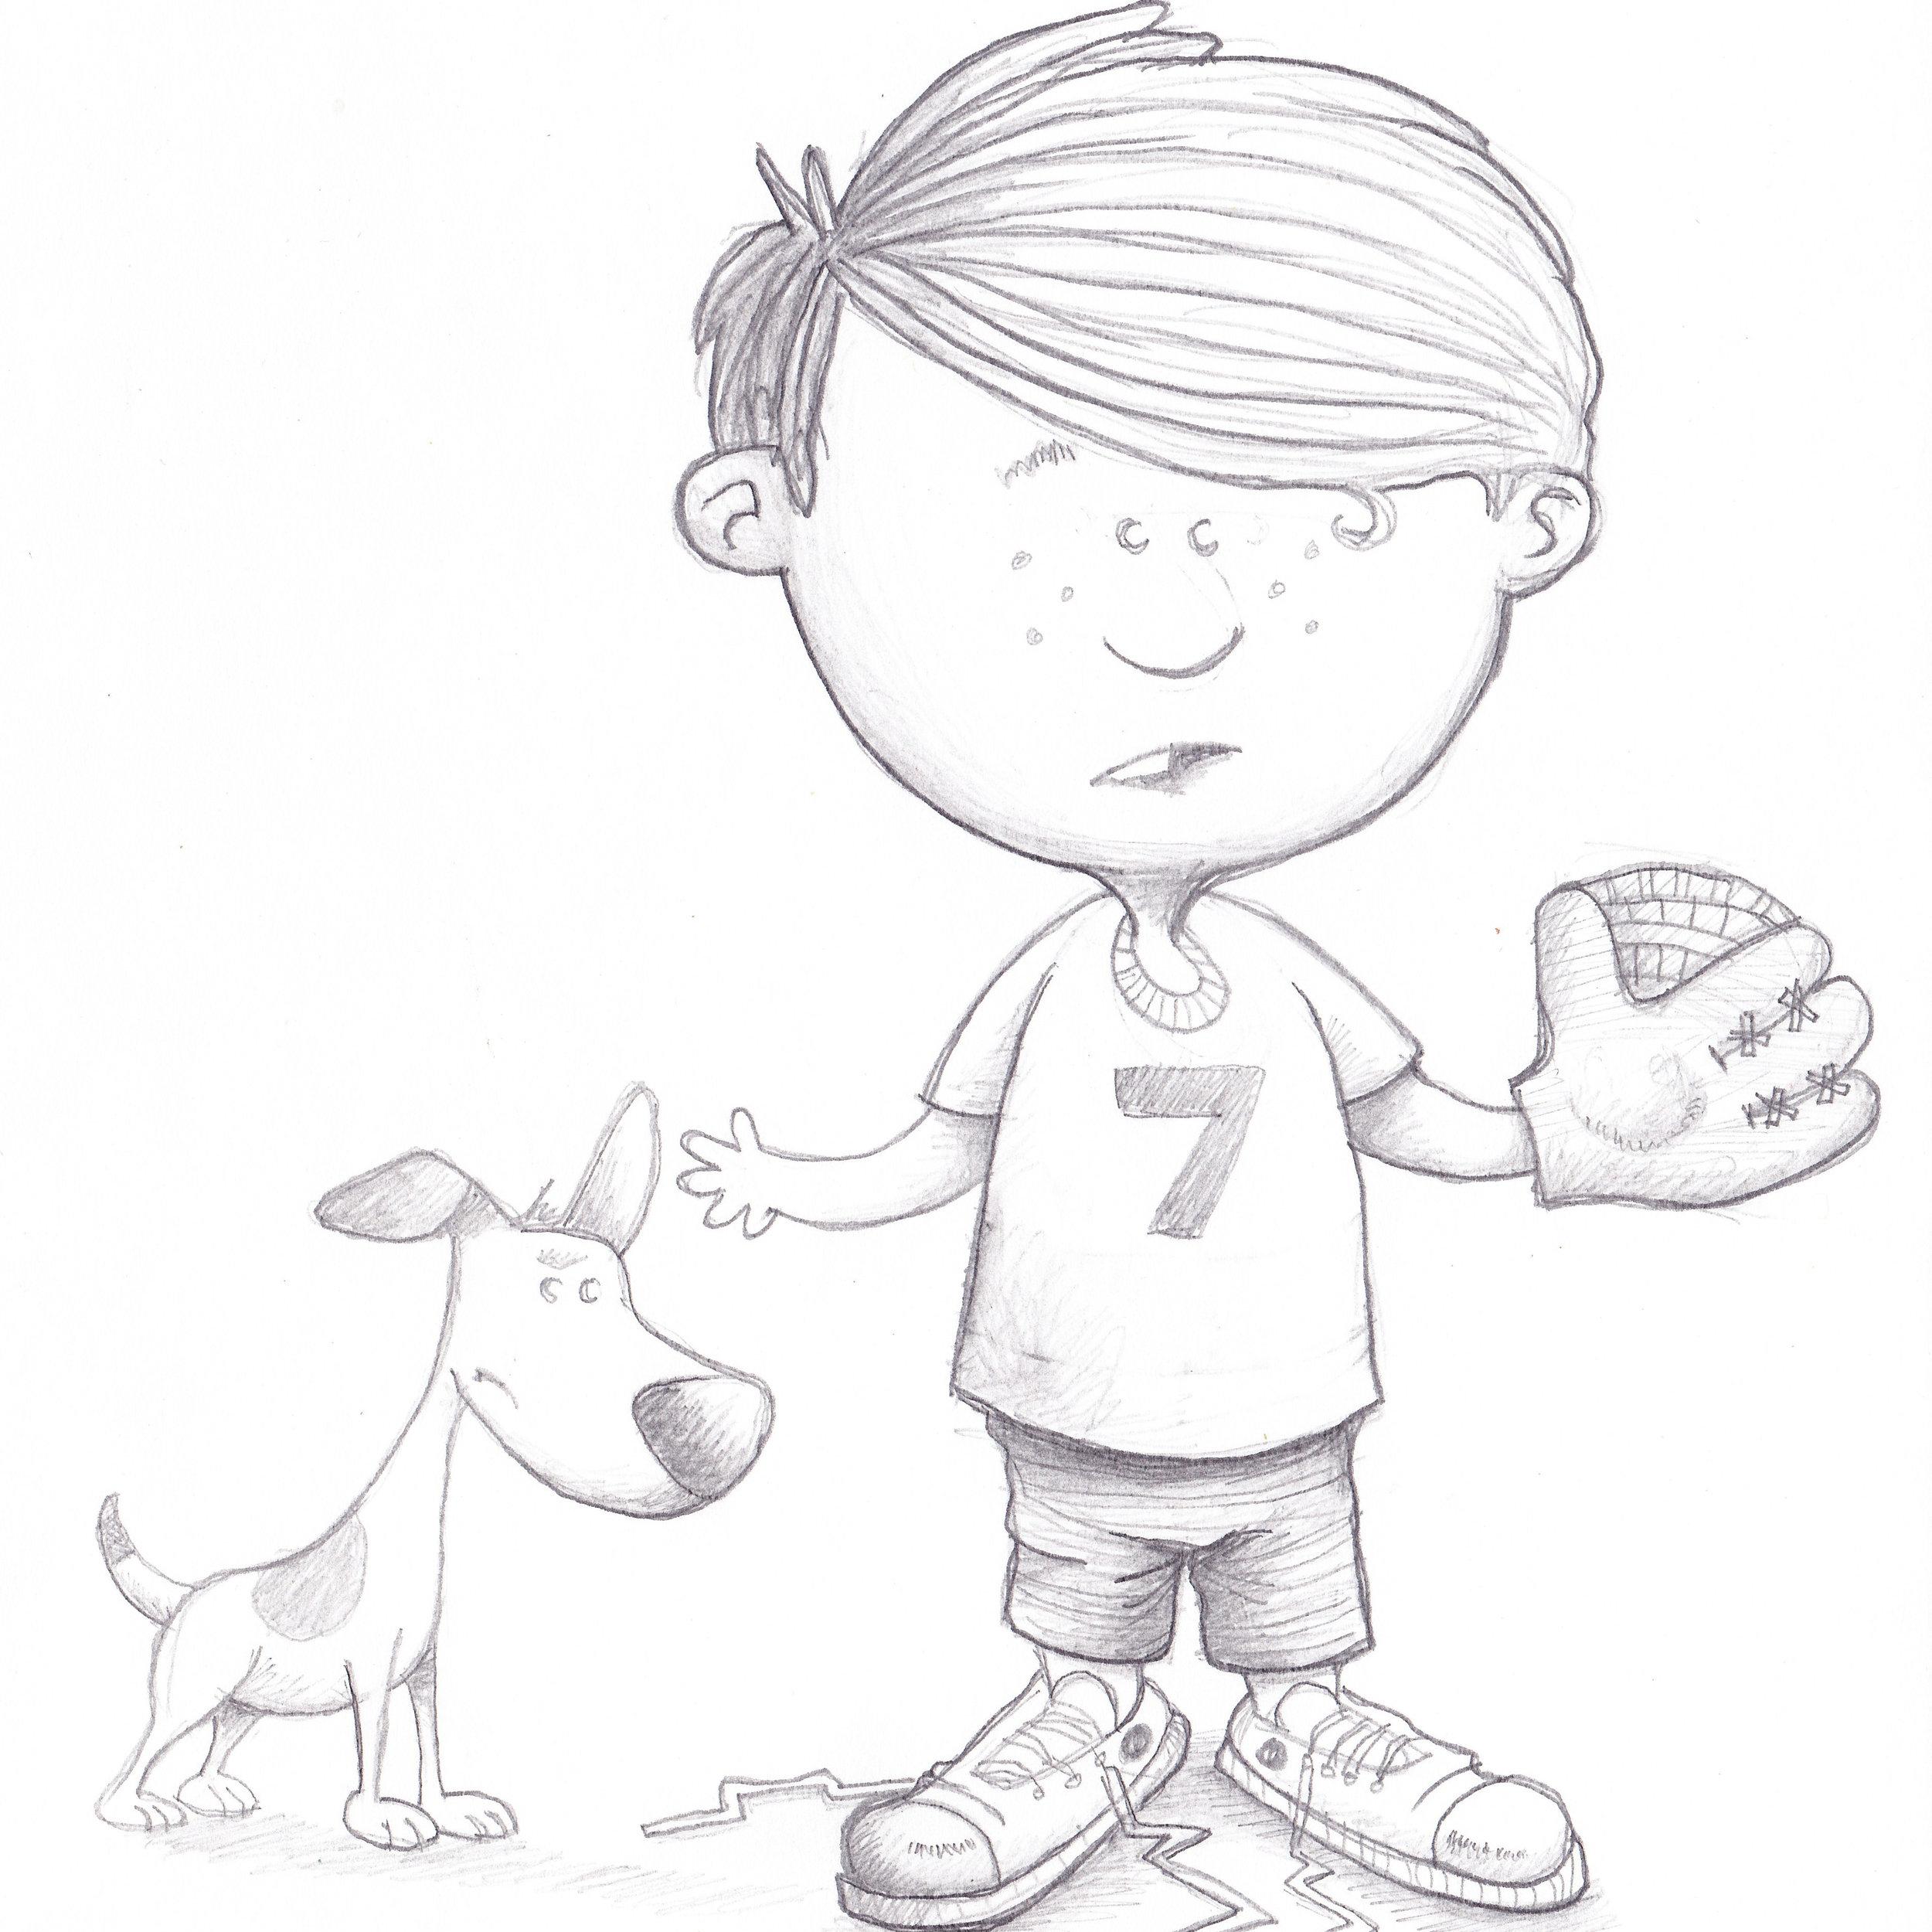 Doodles & More -